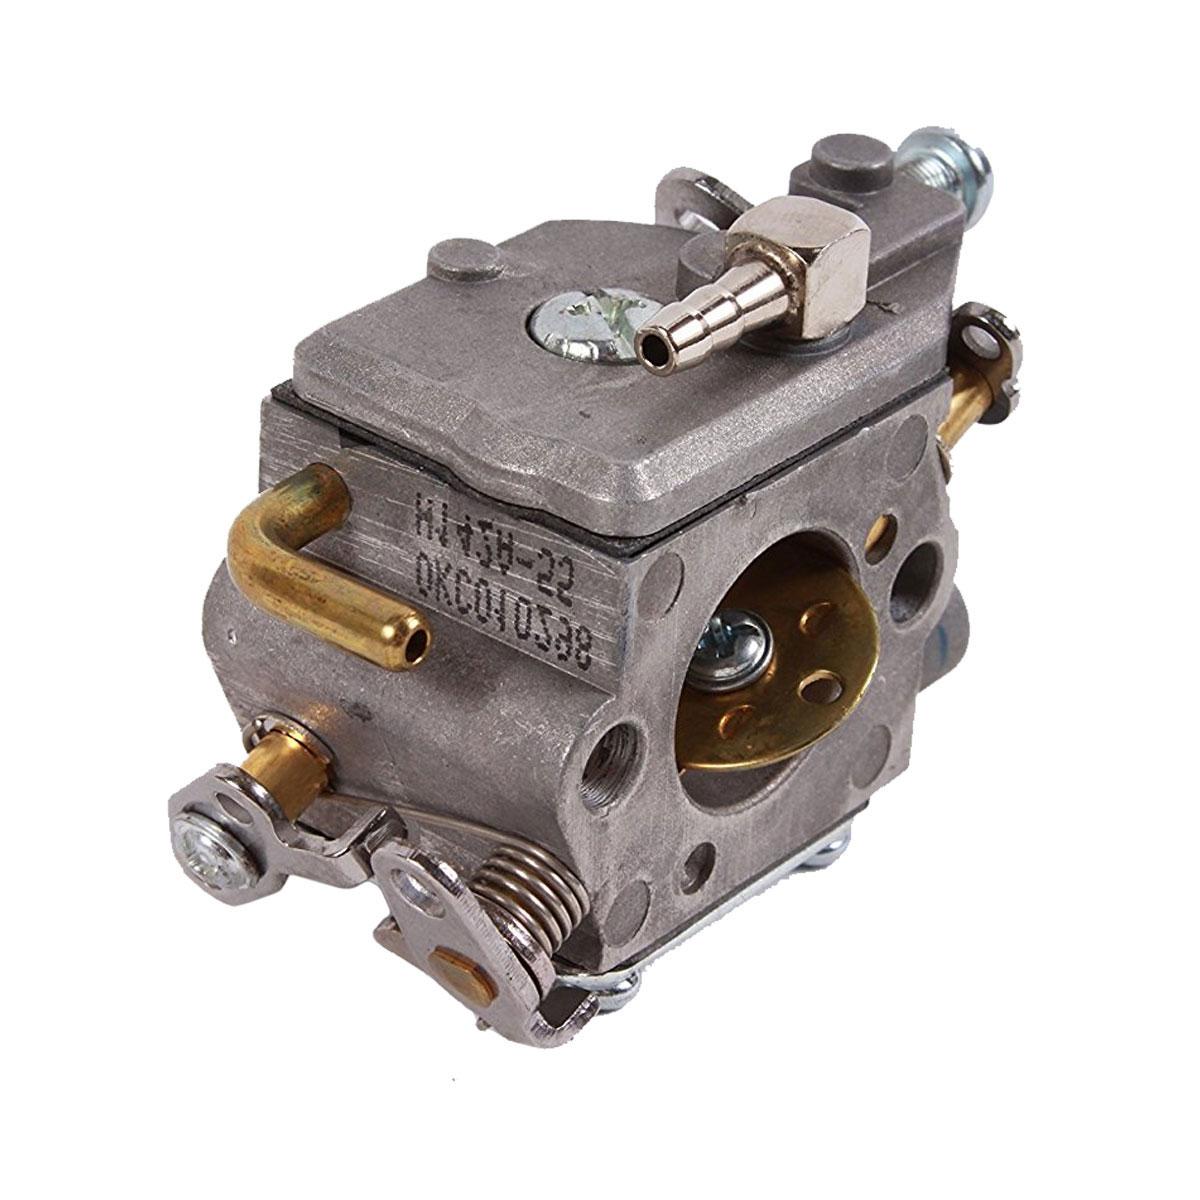 Walbro Carburetor Diagram Small Engine